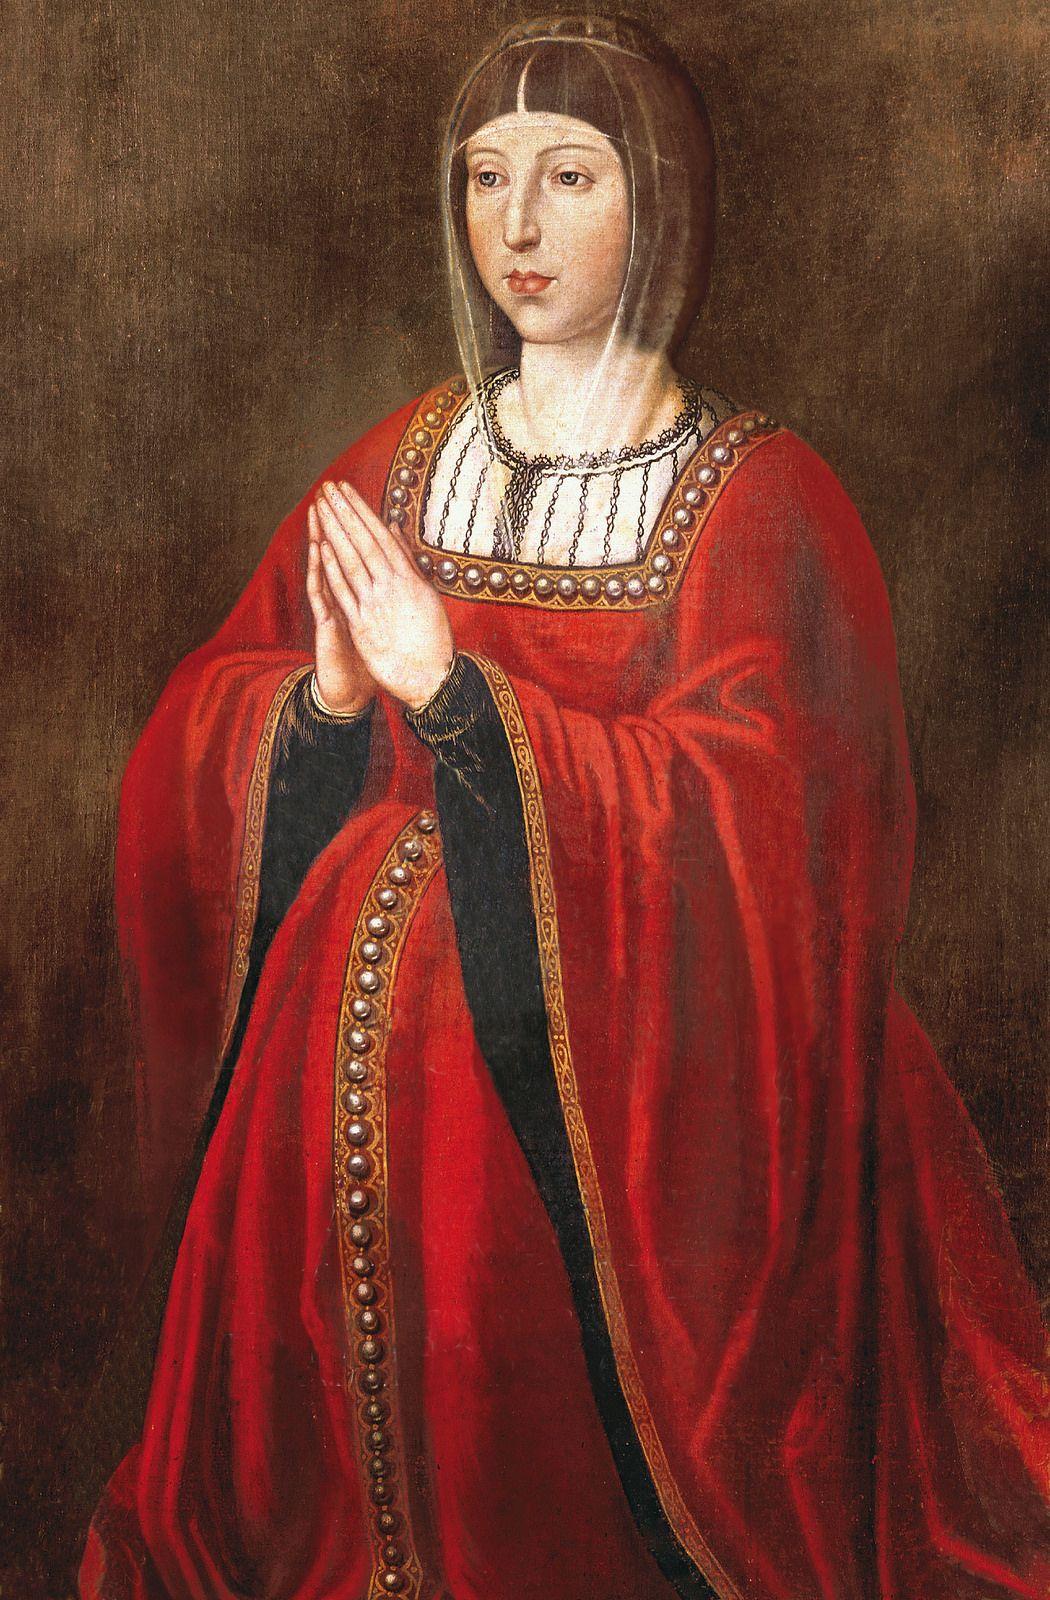 La reina Isabel I Tudor-para mujer inglés monarca británico realeza renassiance